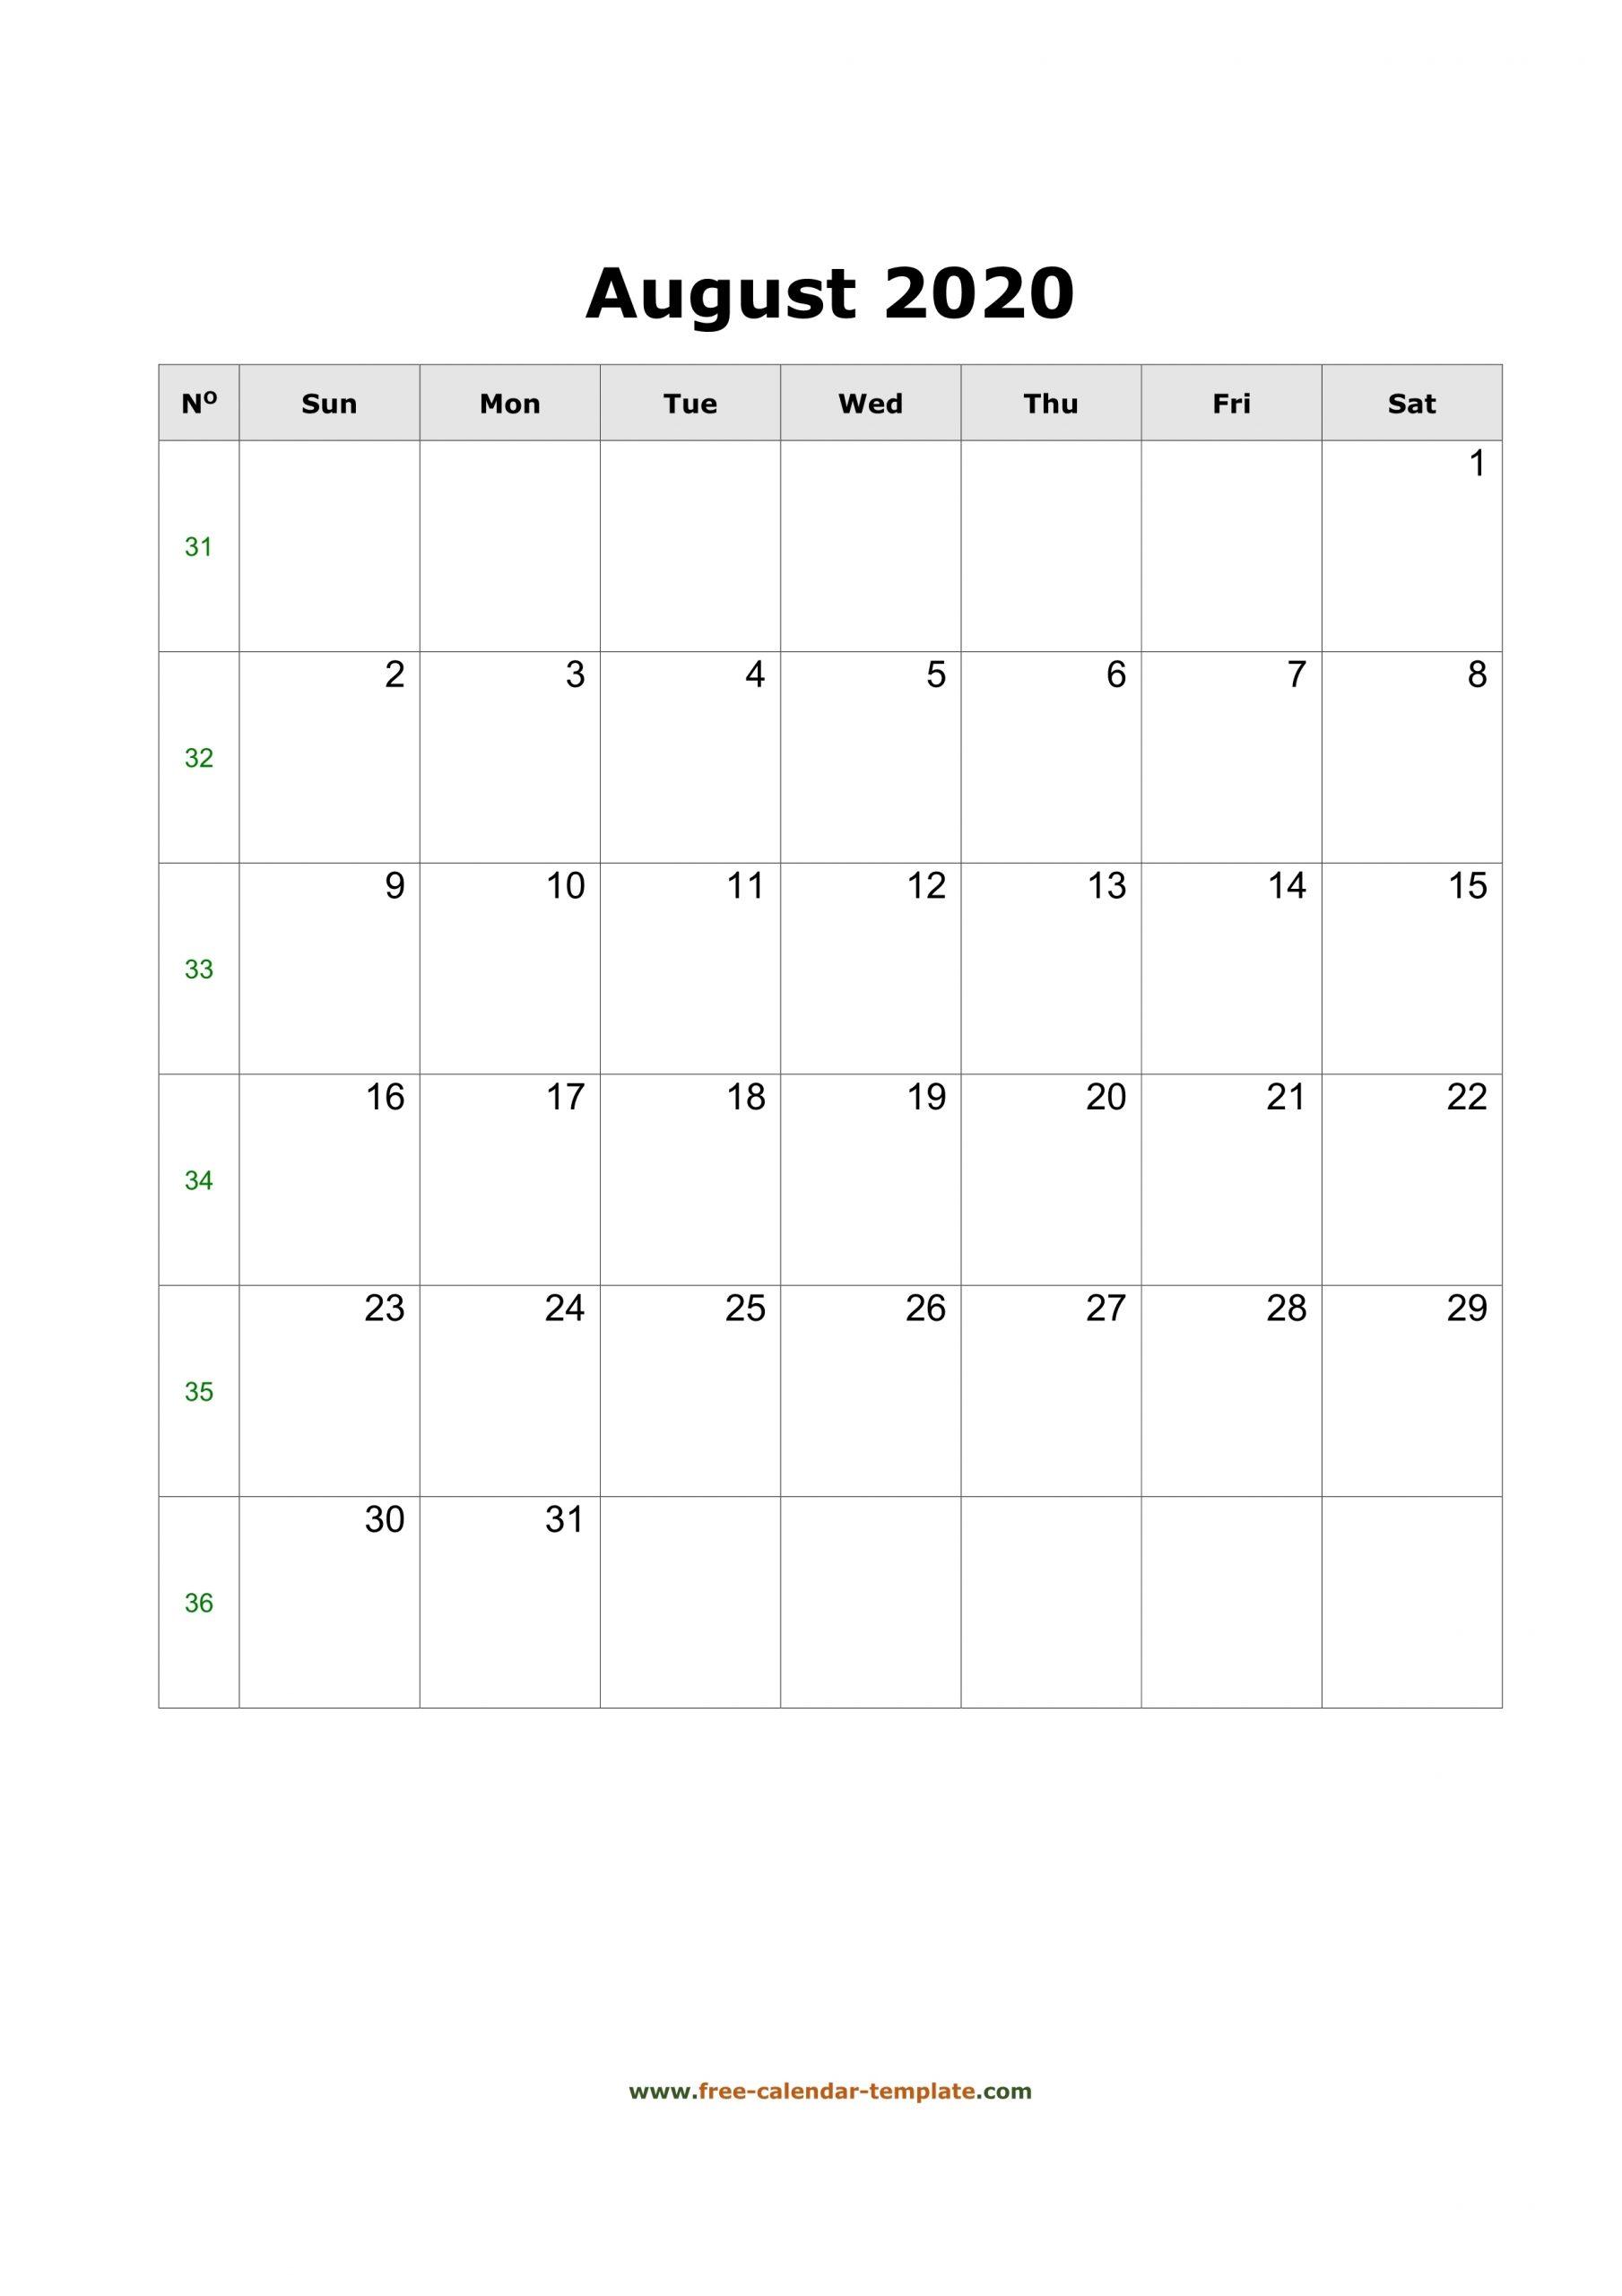 2020 August Calendar (Blank Vertical Template) | Free throughout Large Box Calendar 2020 Printable